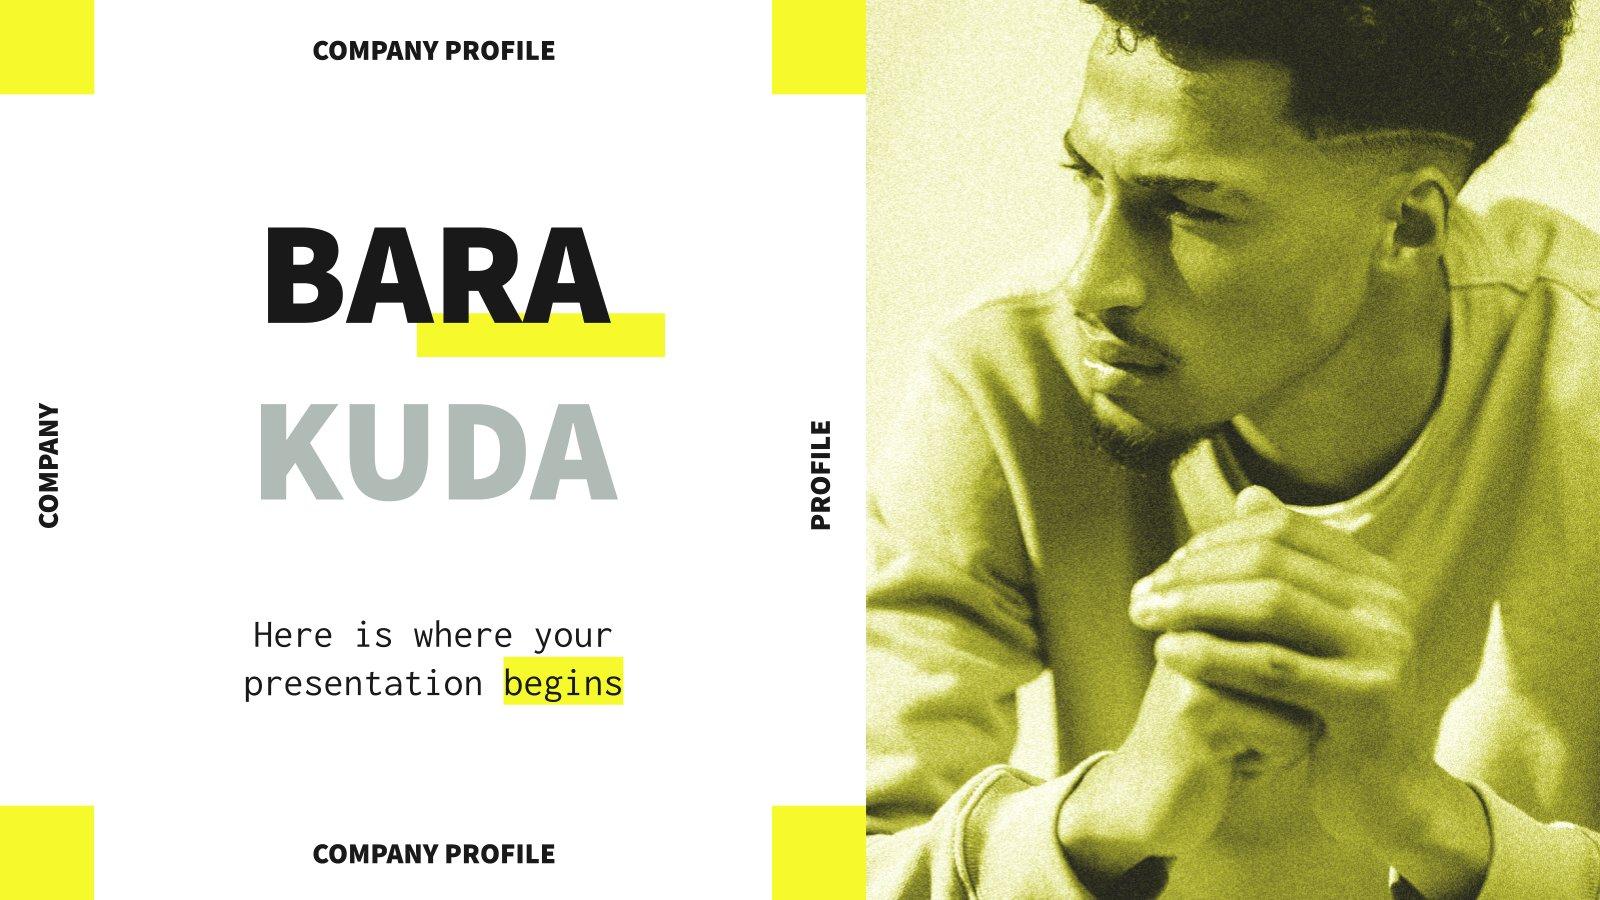 Barakuda Company Profile presentation template